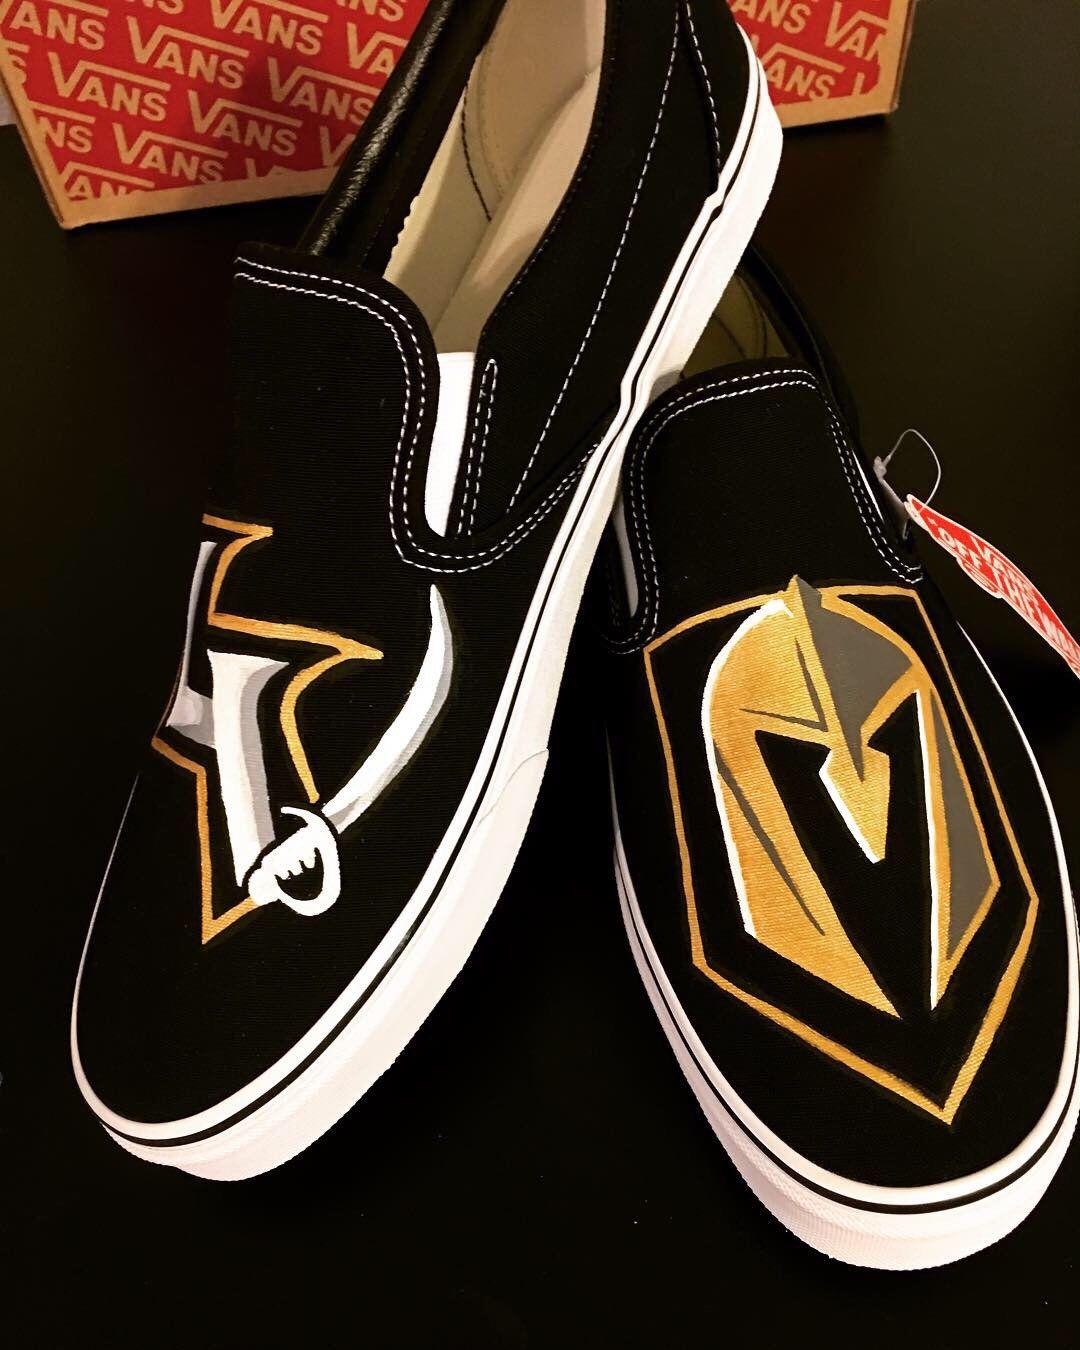 Las Vegas Golden Knights Painted Vans Etsy Vegas Golden Knights Golden Knights Painted Vans